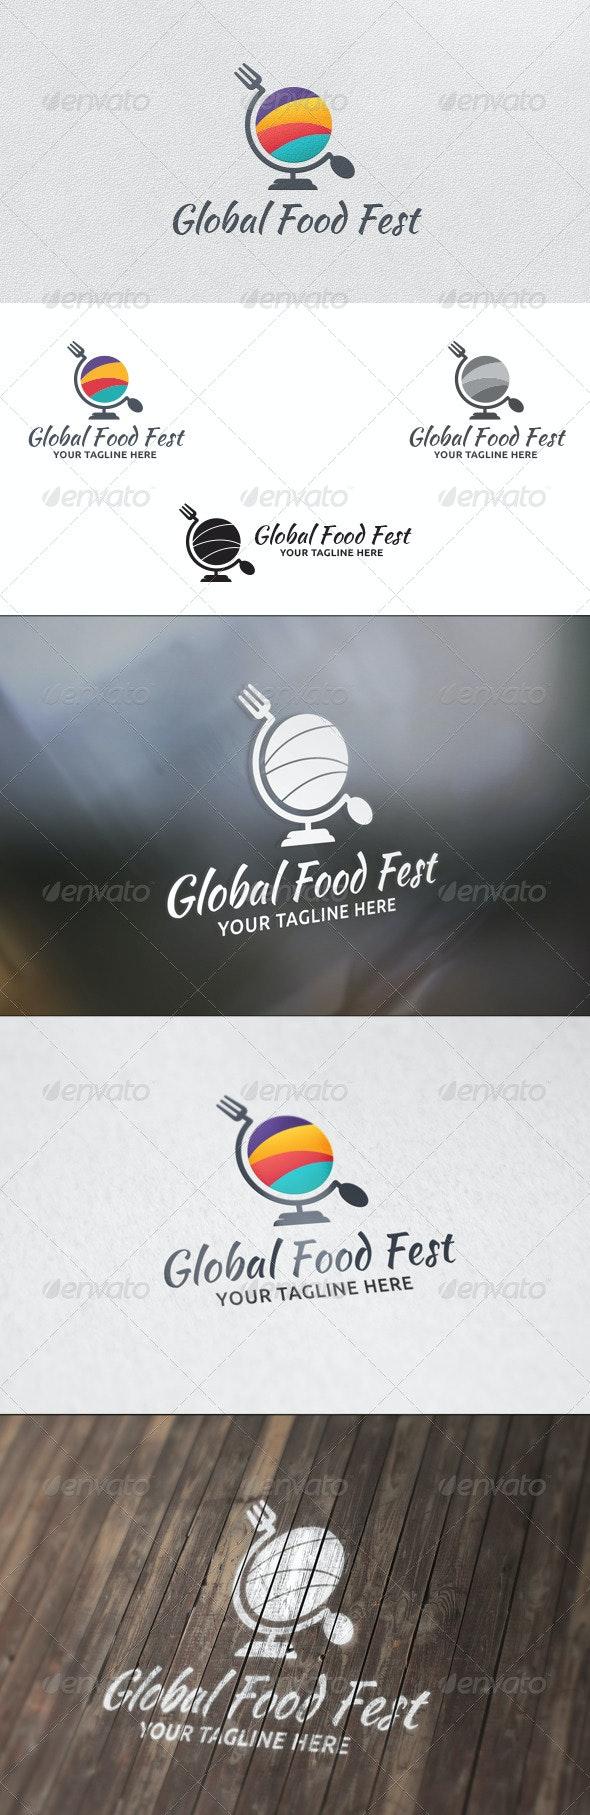 Food Festival - Logo Template - Food Logo Templates